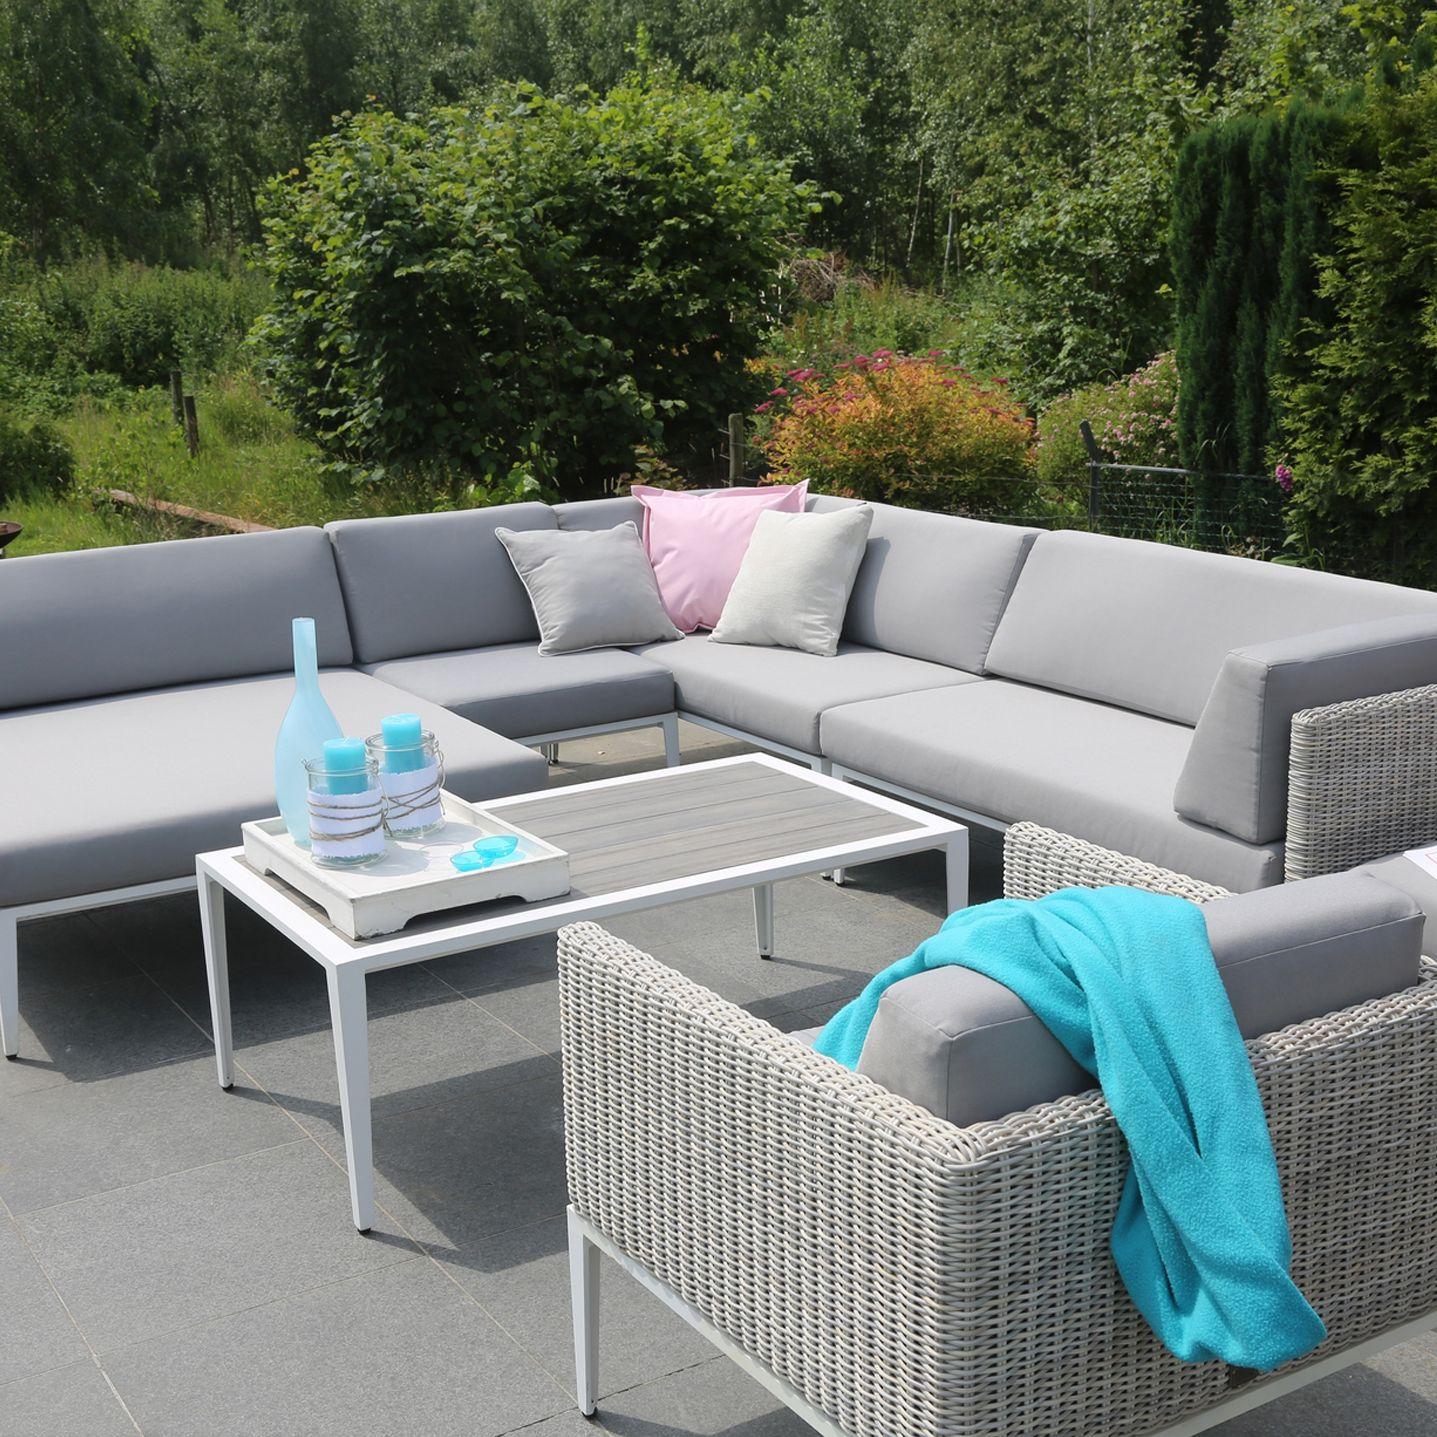 4 Seasons Outdoor Riviera 8-Seater Lounge Set